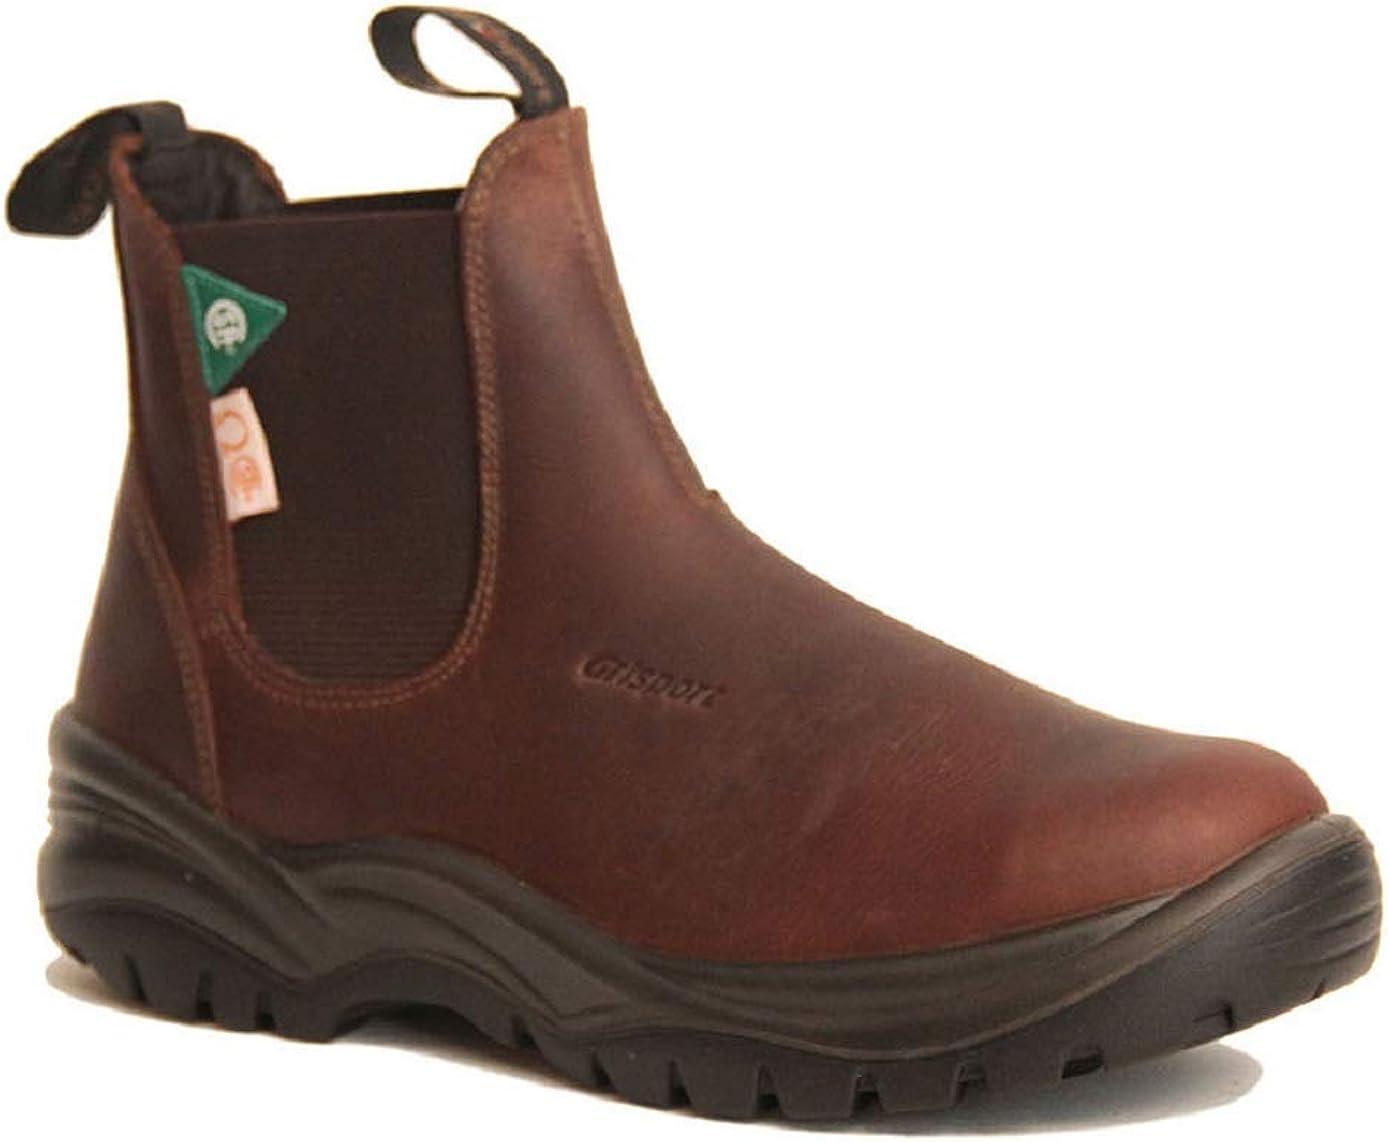 Grisport Men's Safety Boots Steel Toe